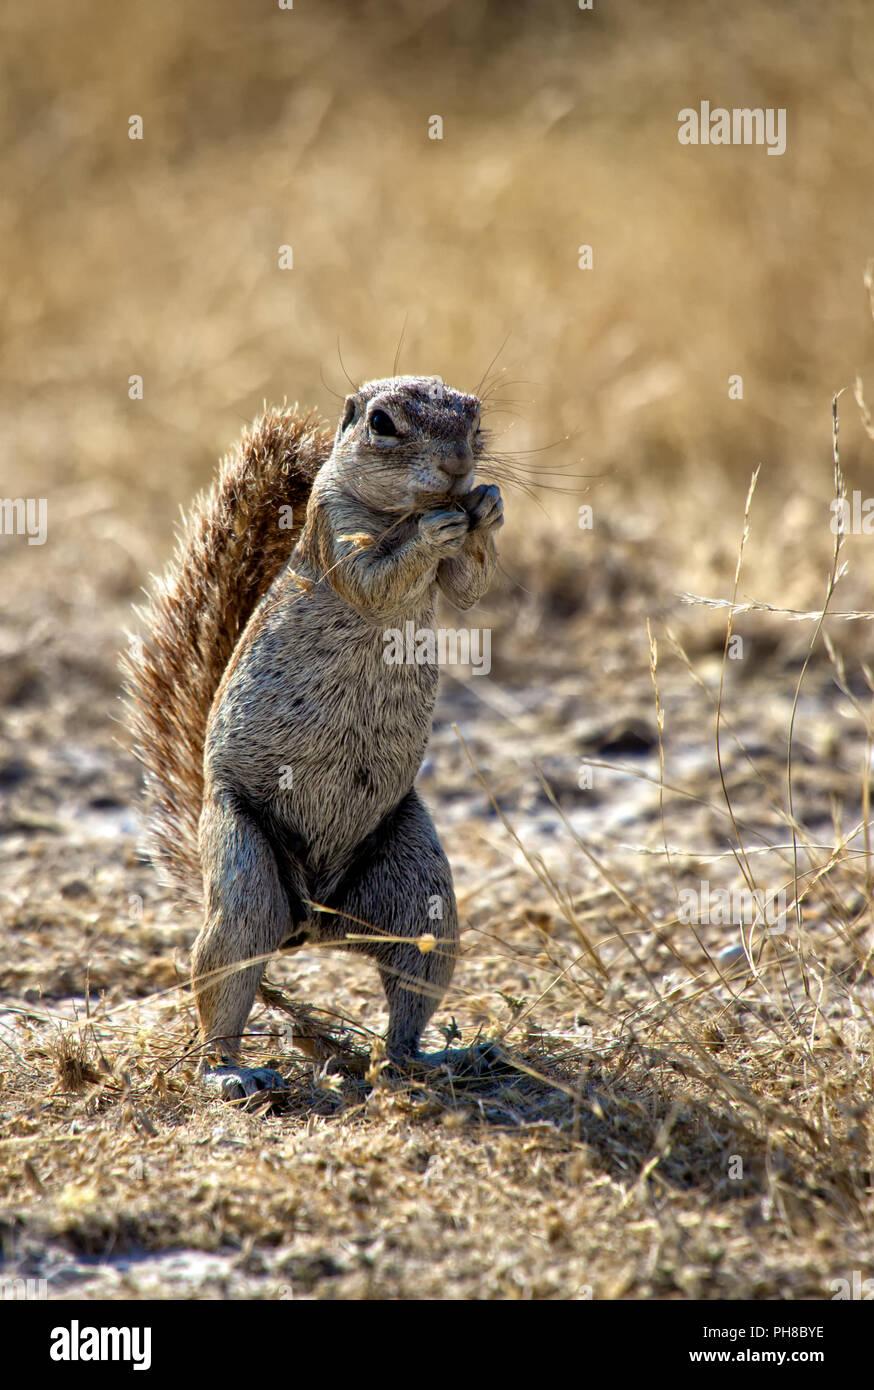 a ground squirrel in etosha national park namibia - Stock Image